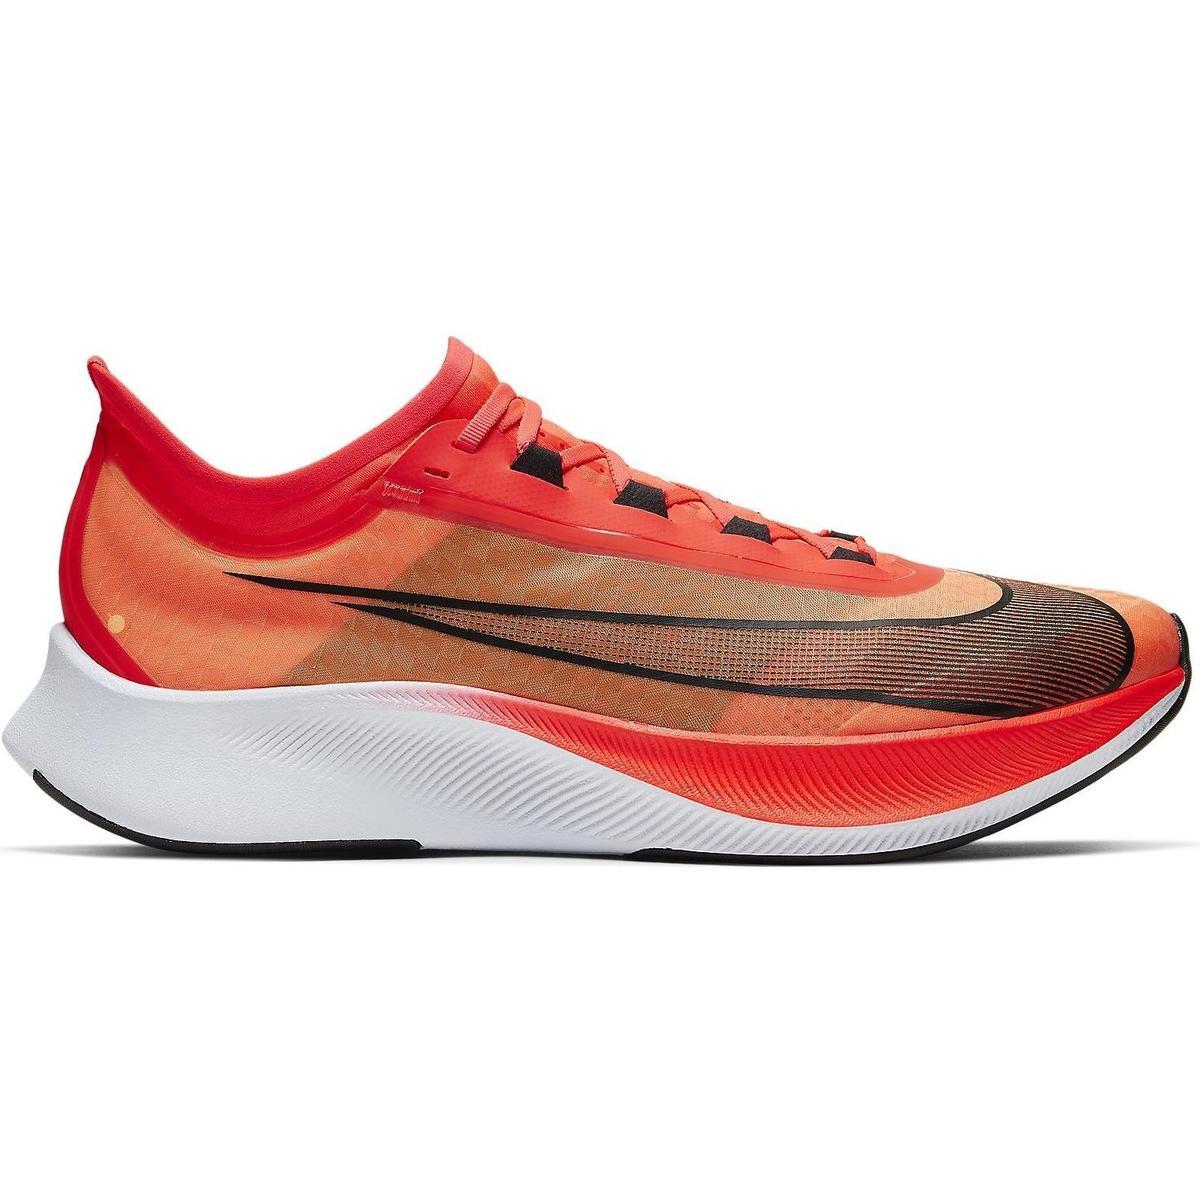 Köp nu Dam Nike Air Force 1 '07 Vit Peach Cream Skor